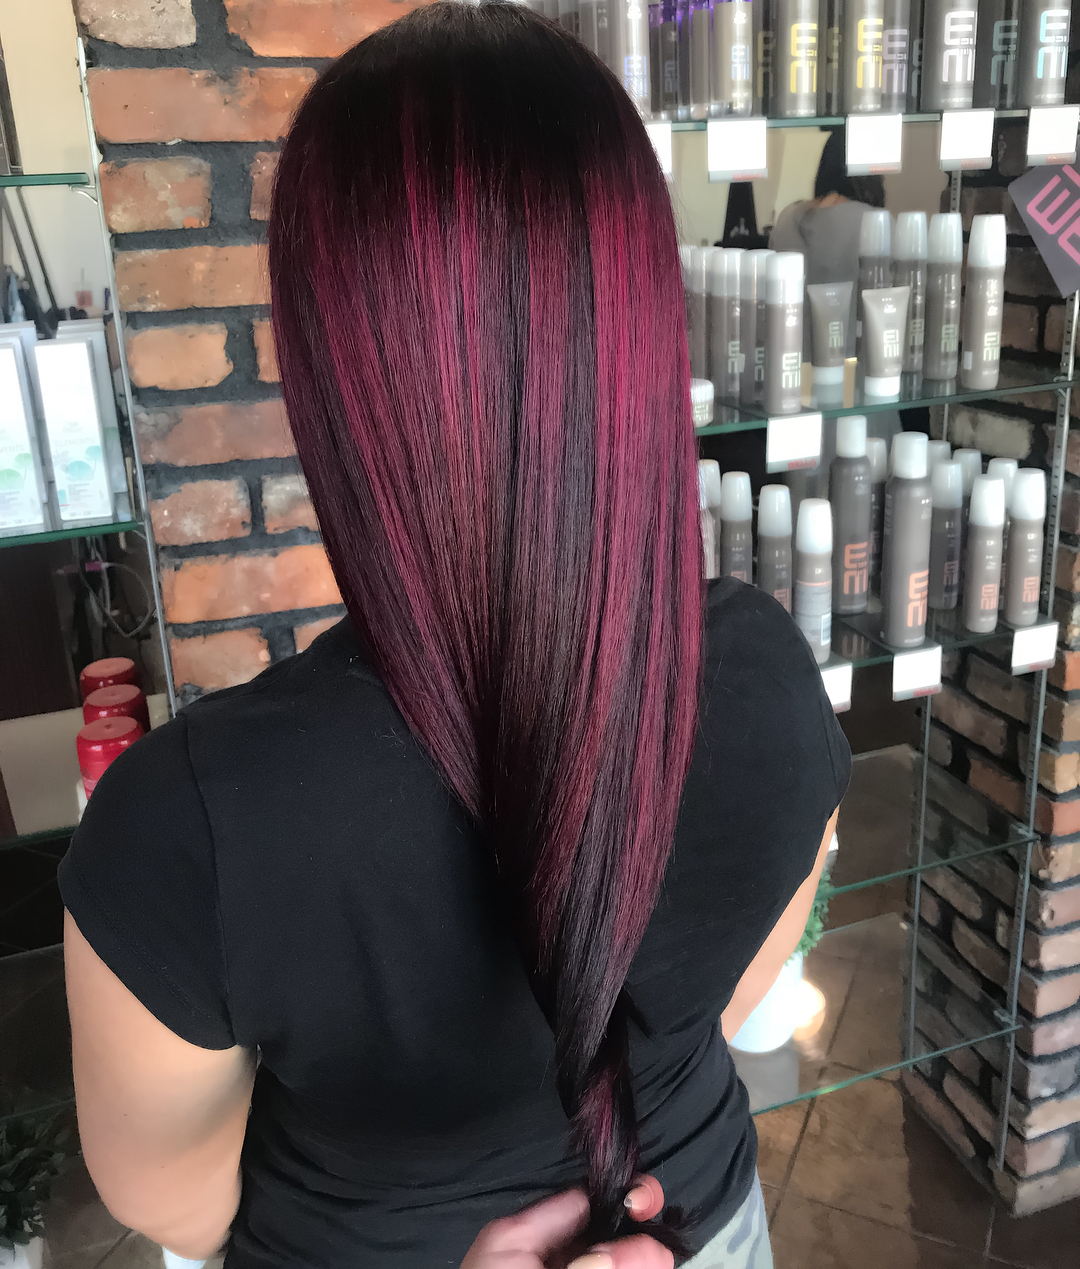 Окрашивание волос зима 2019-2020 фото 10